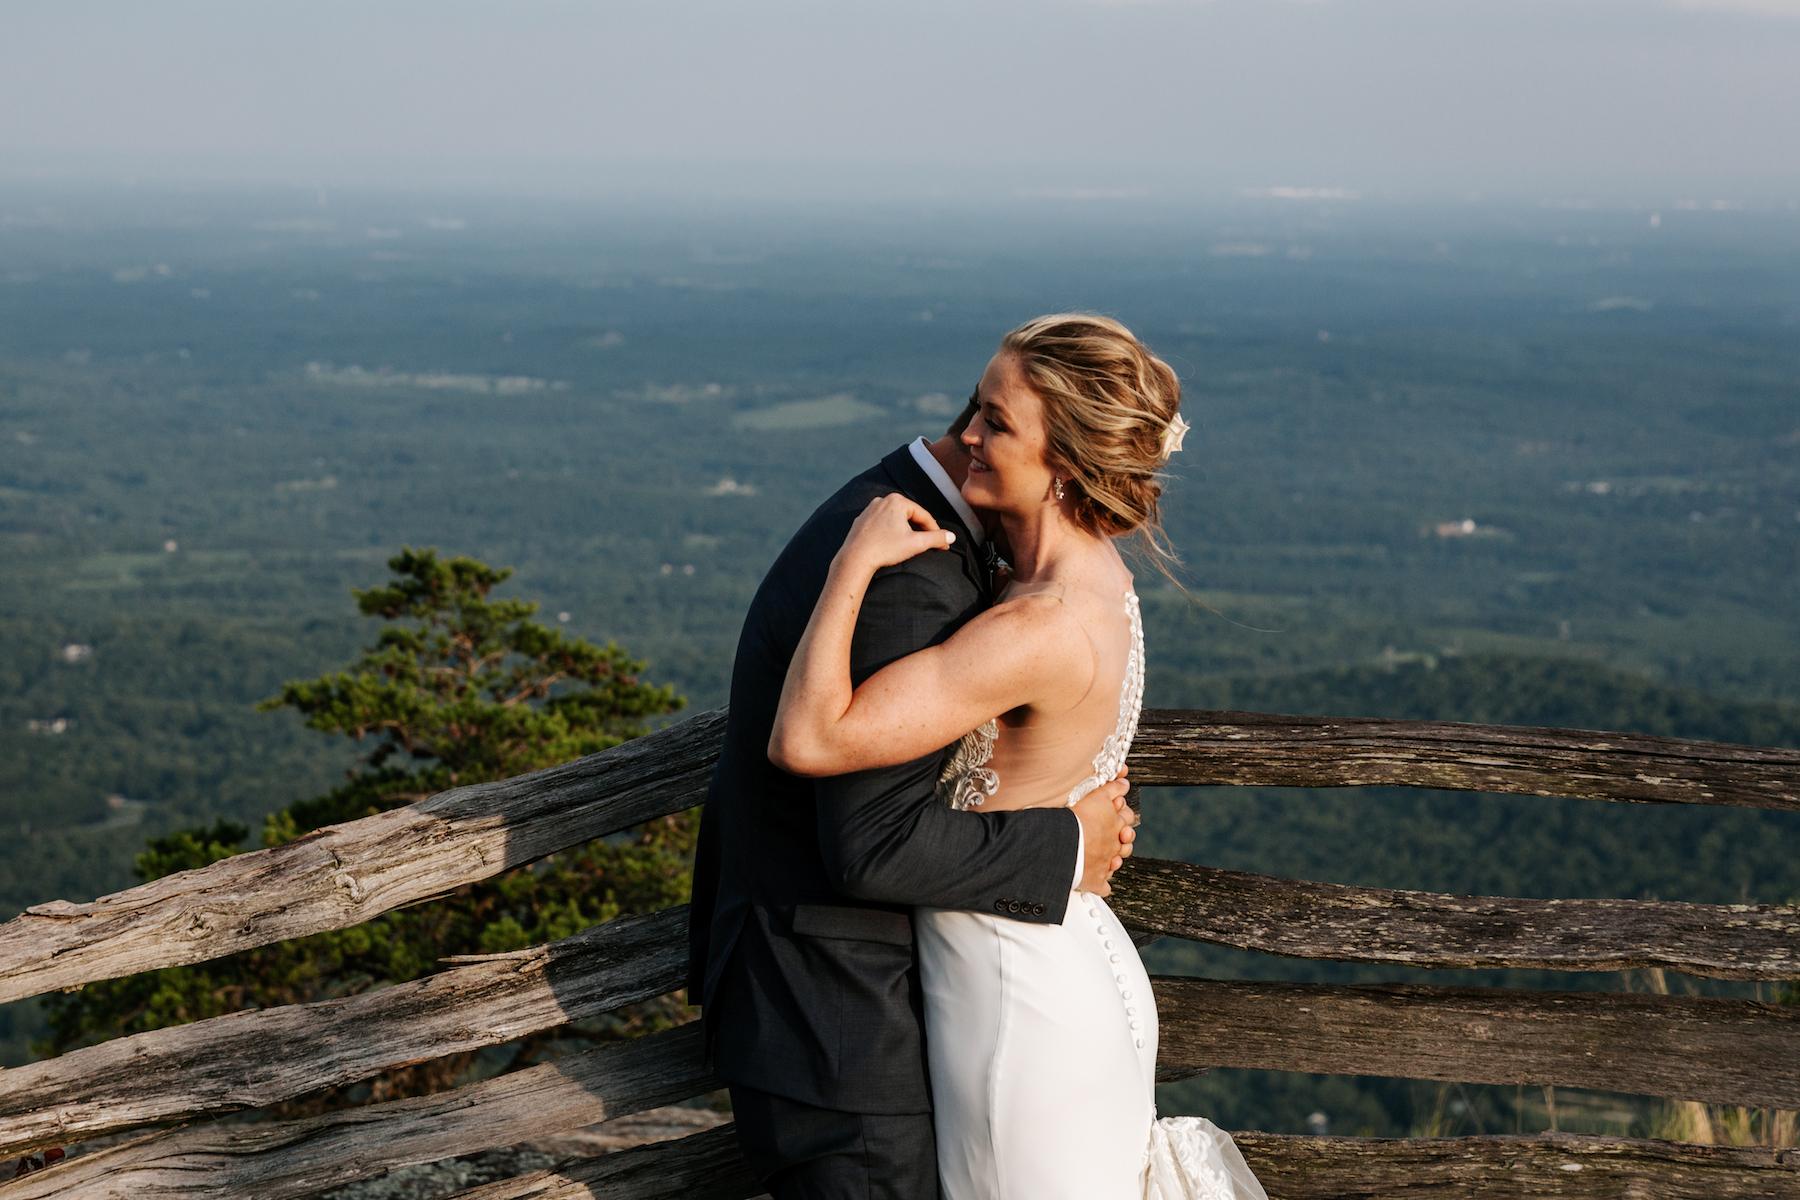 wedding-engagement-photographer-spartanburg-greenville-columbia-carolina-south-north-530.JPG